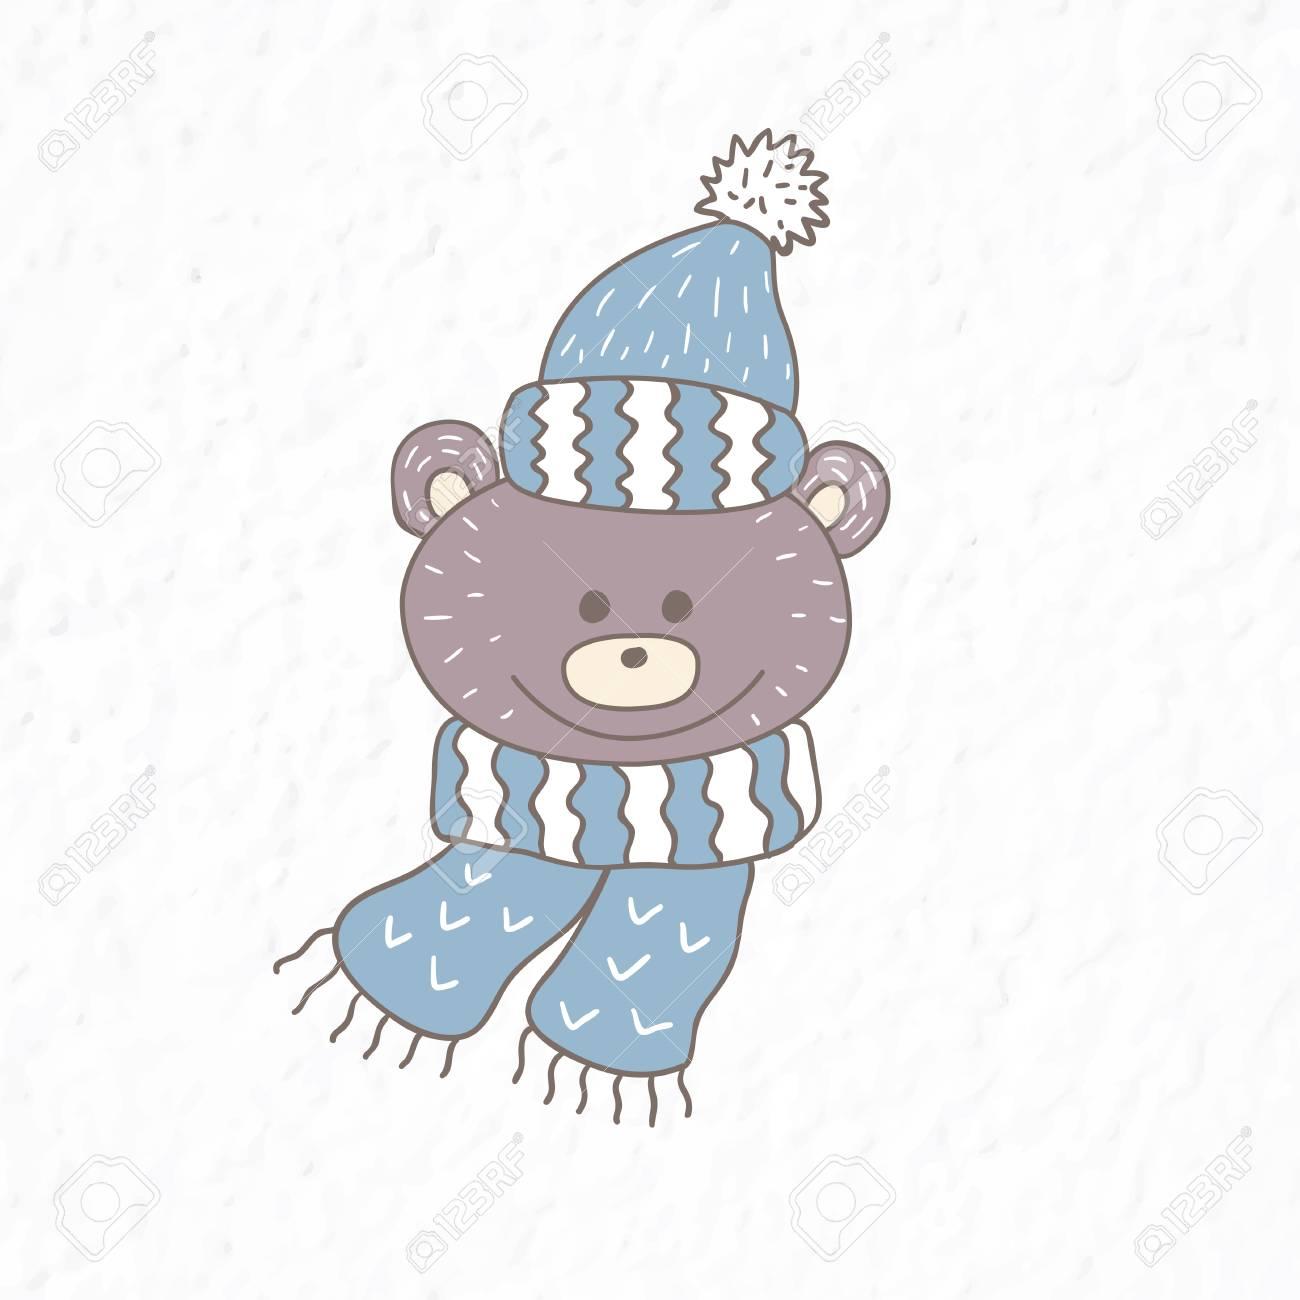 1075fa05 Funny teddy bear. Nursery art. Minimalist scandinavian style...